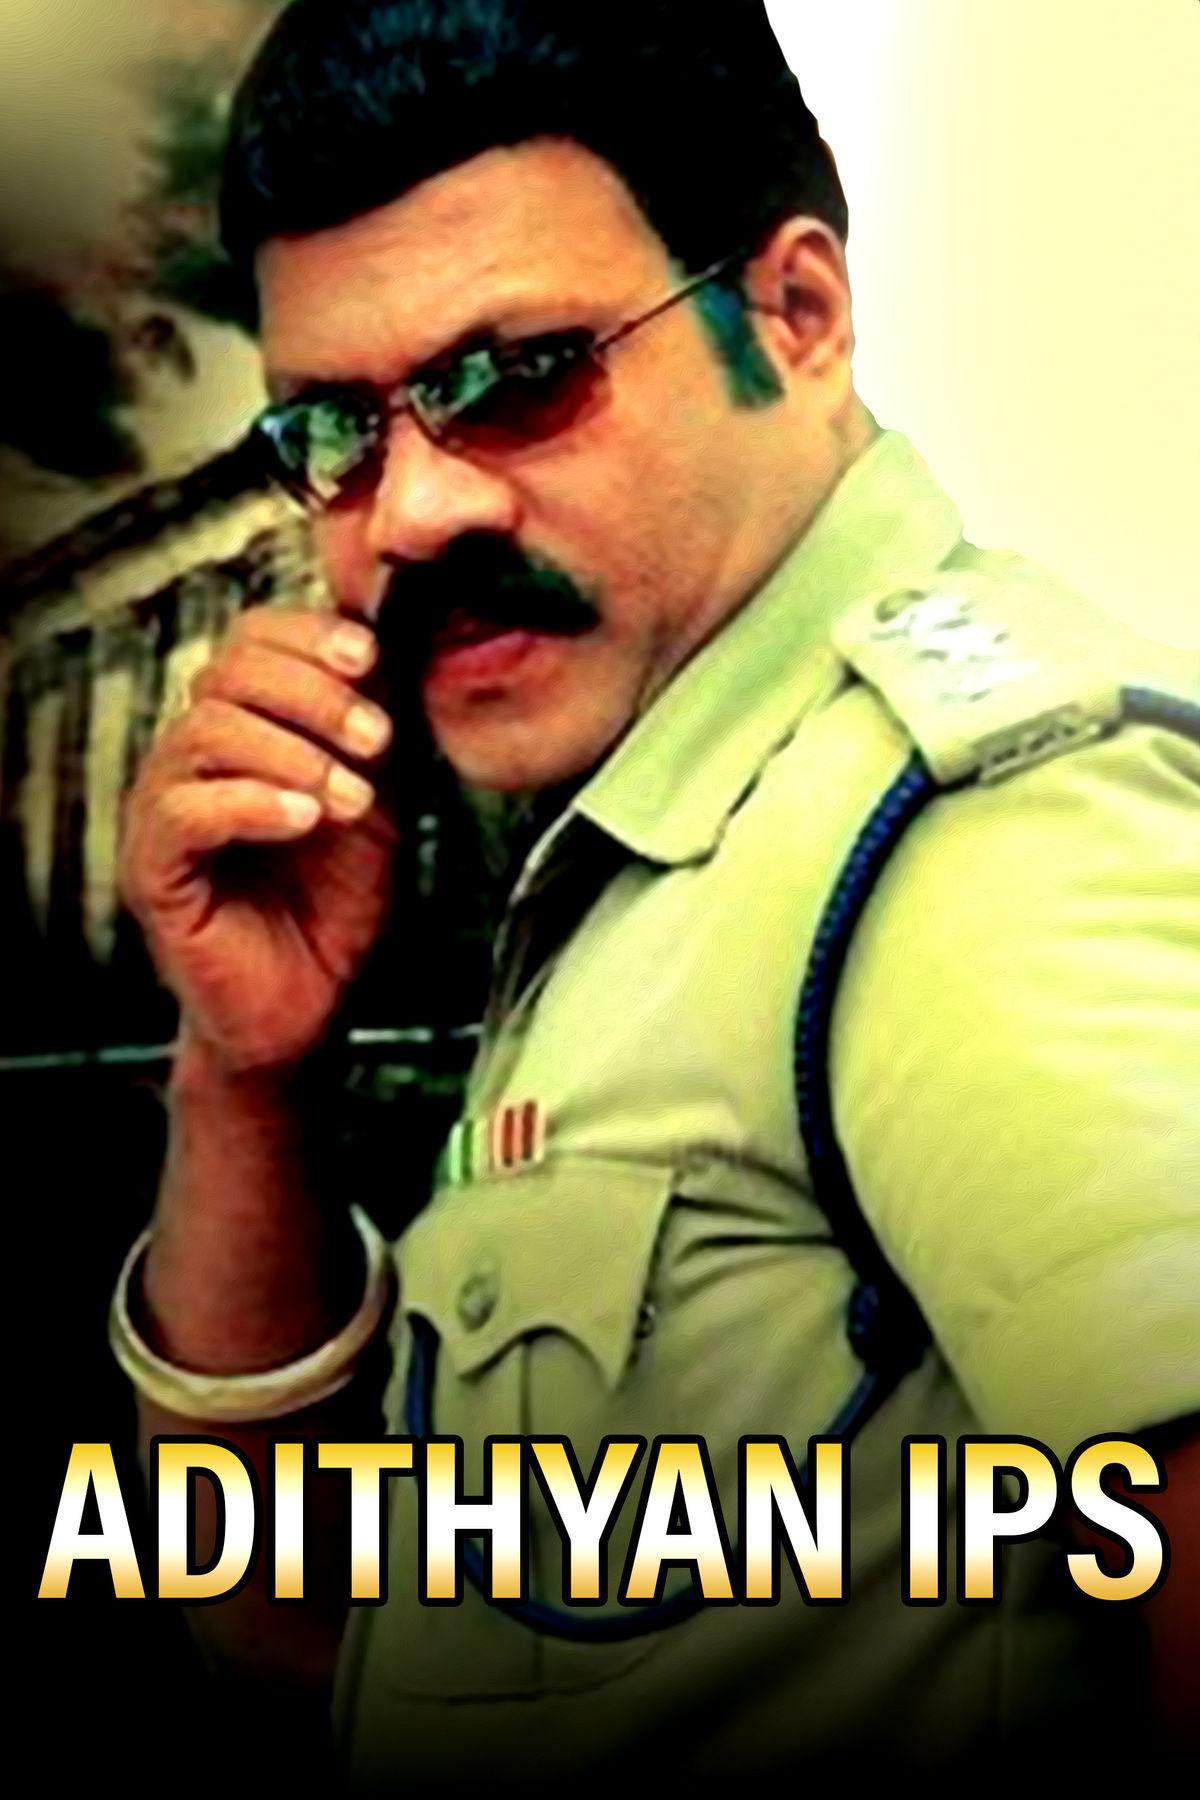 Adithyan IPS